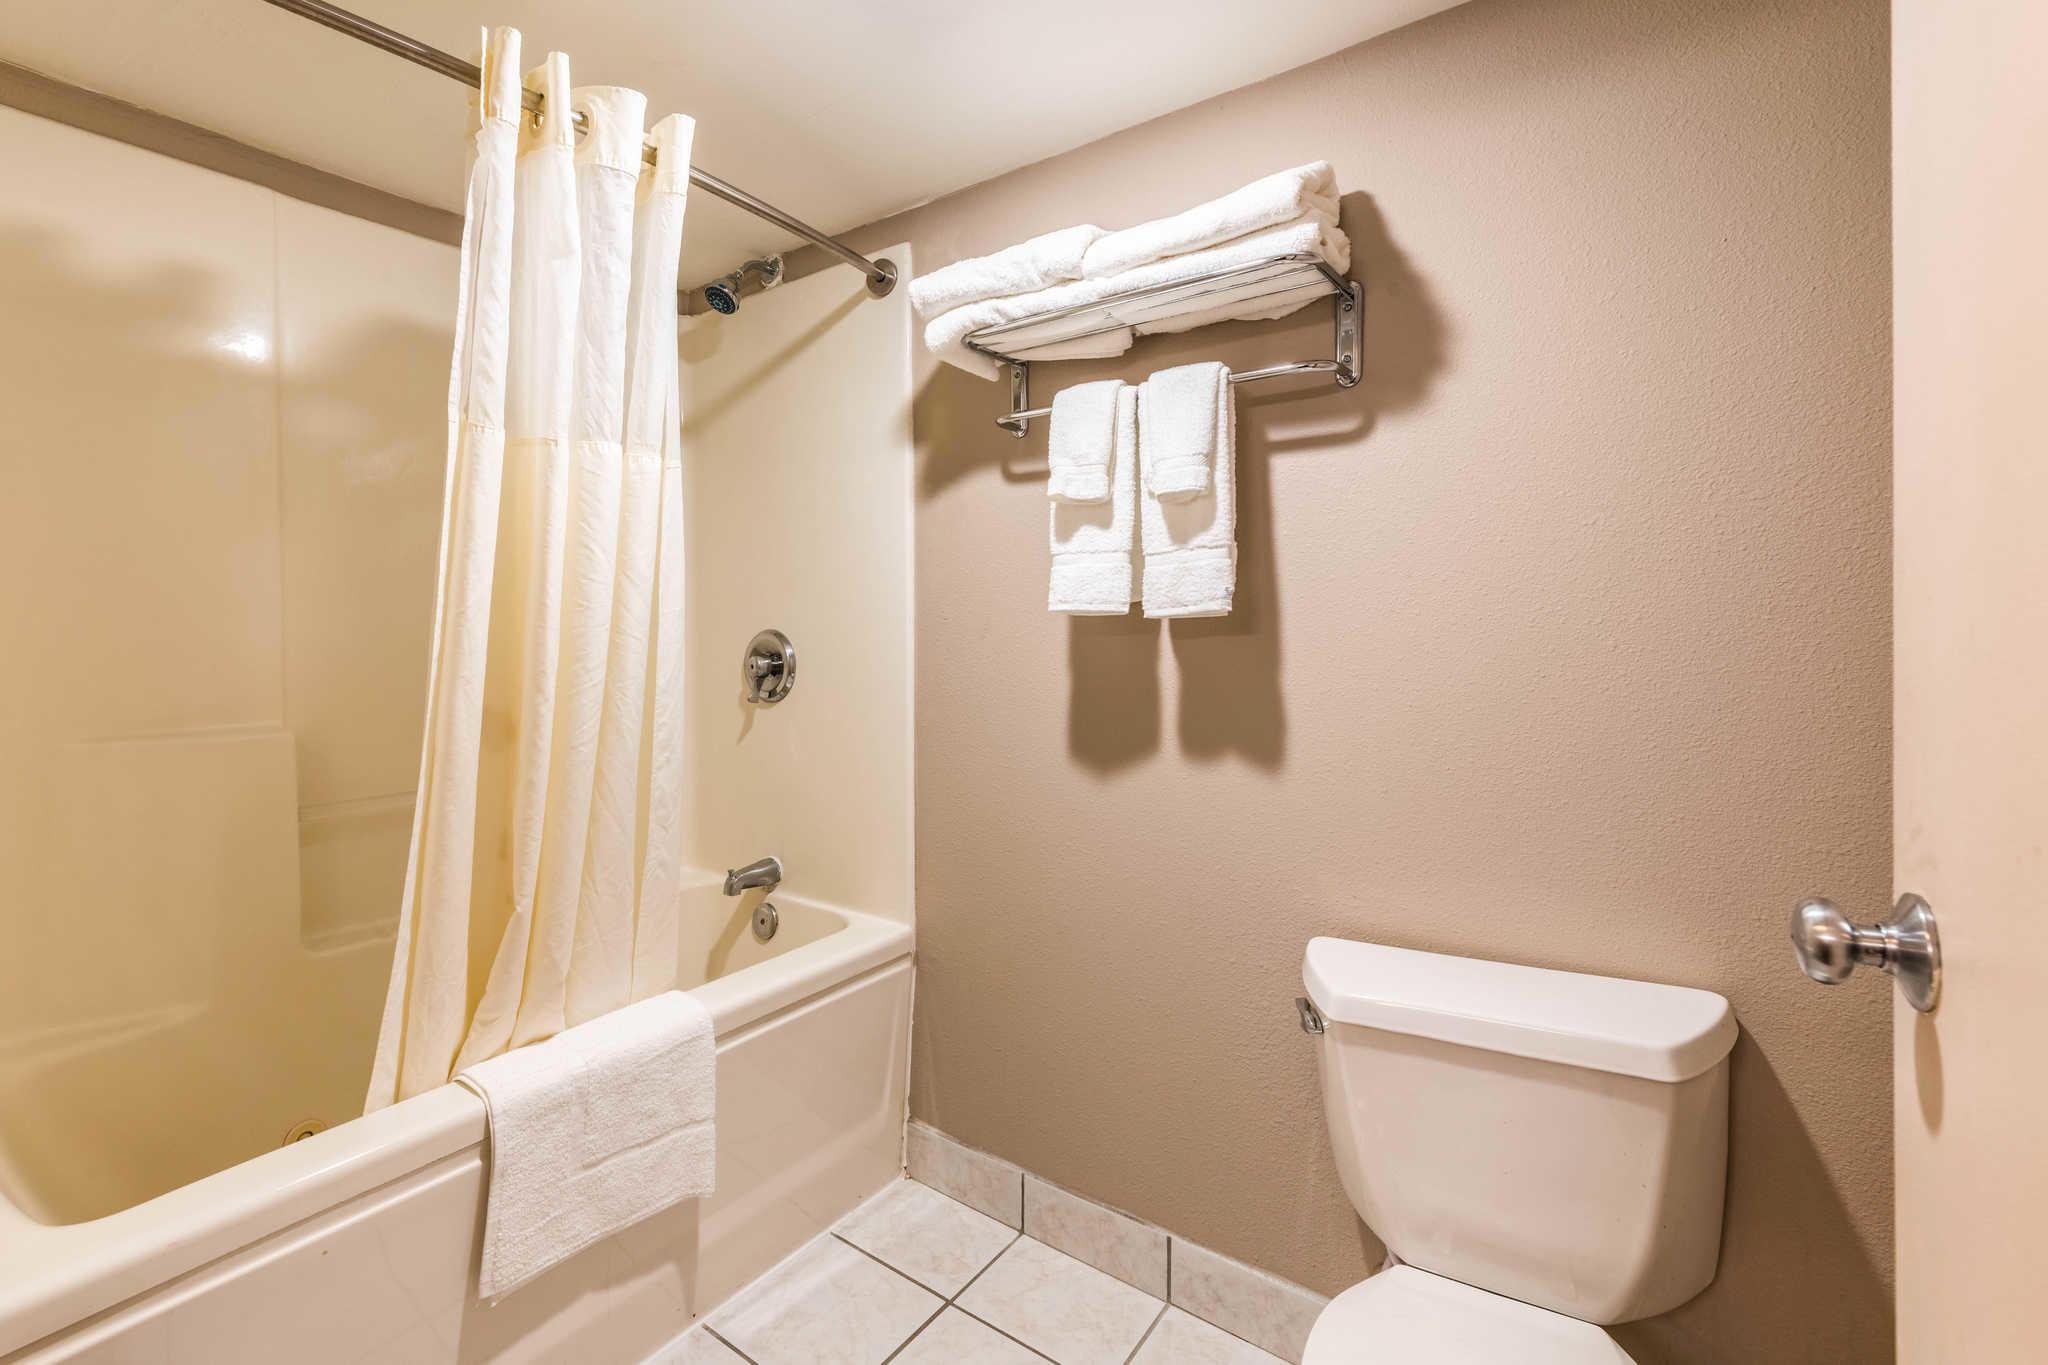 Clarion Inn & Suites image 31